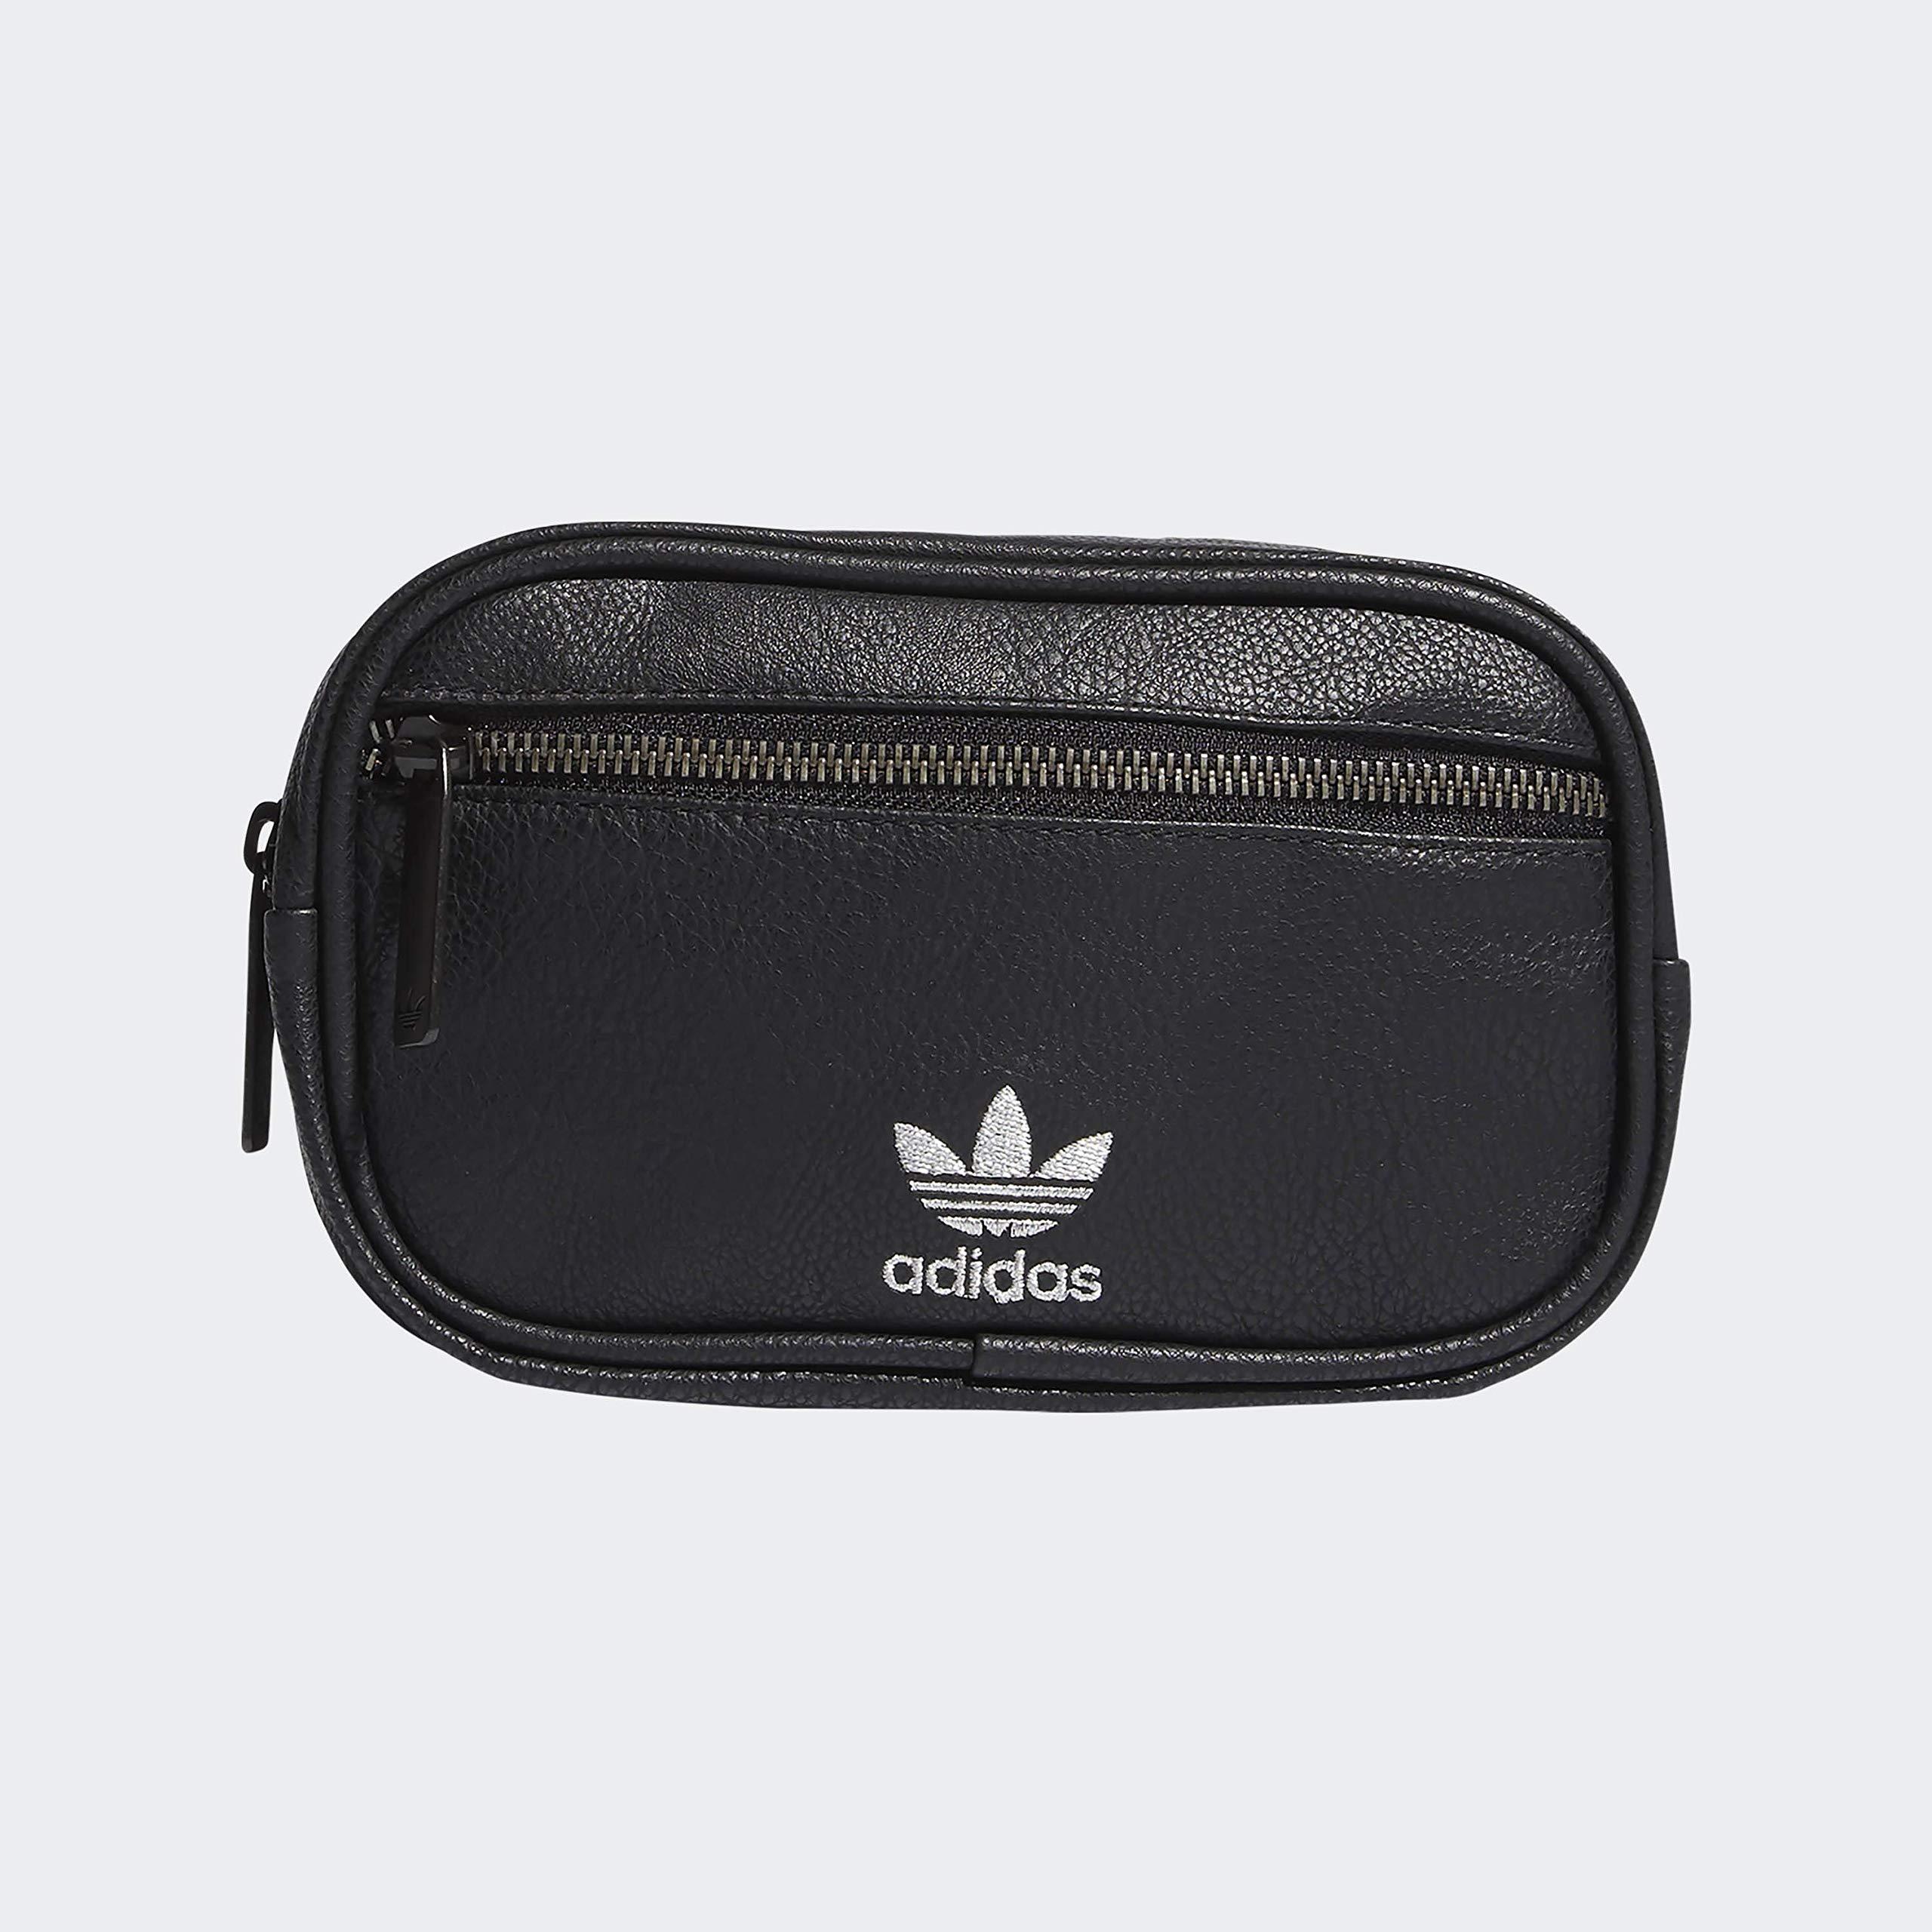 adidas Originals Unisex PU Leather Waist Pack, Black/Silver, ONE SIZE by adidas Originals